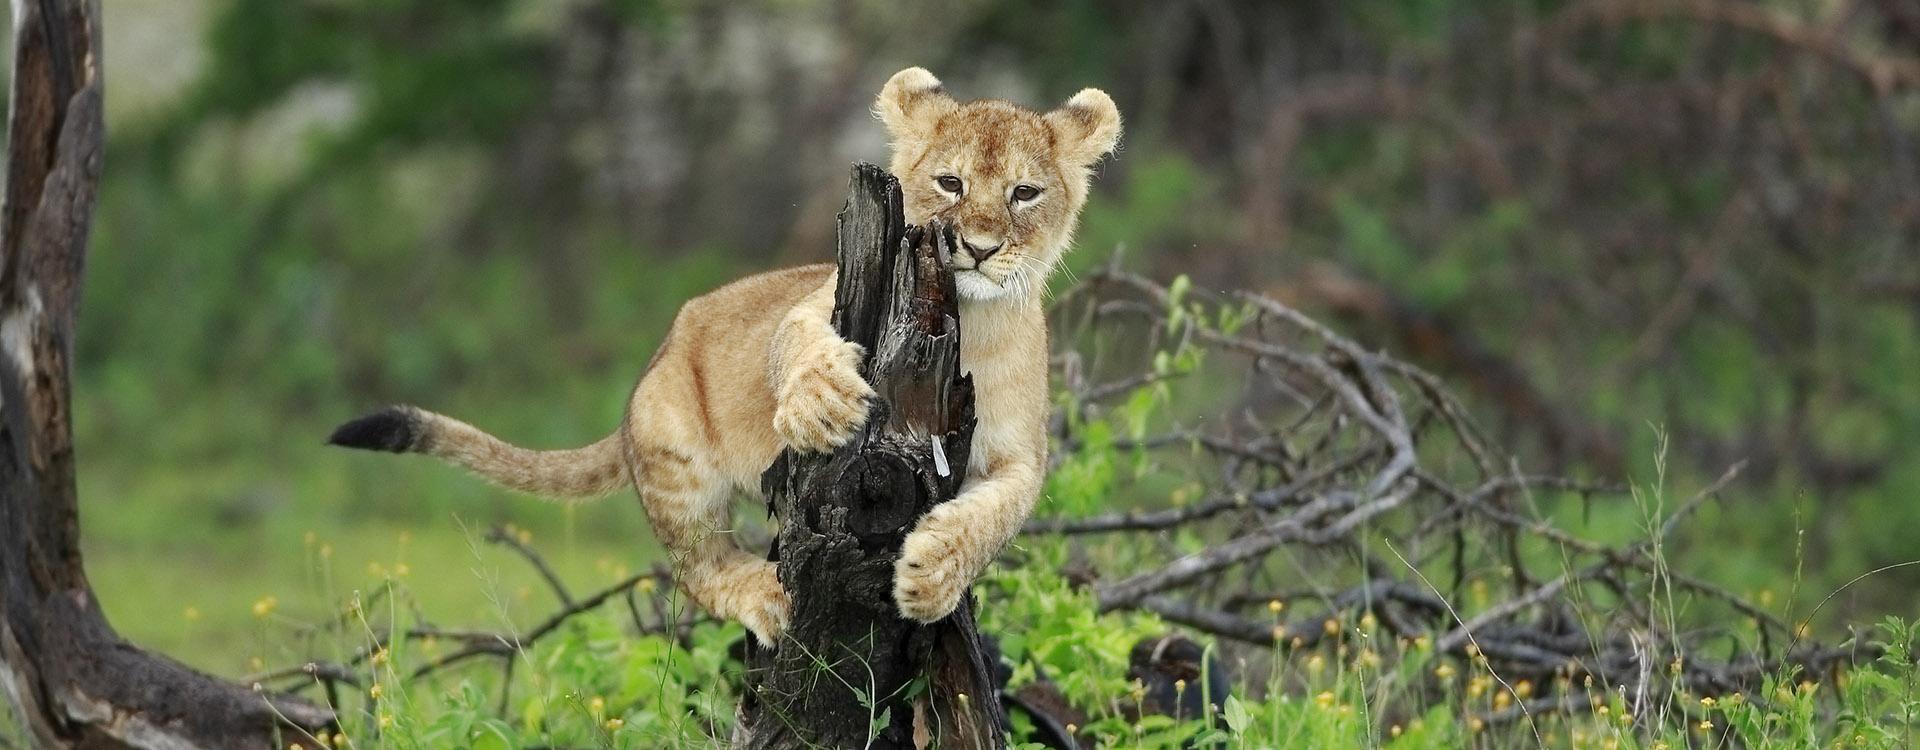 Lion cub play on little tree